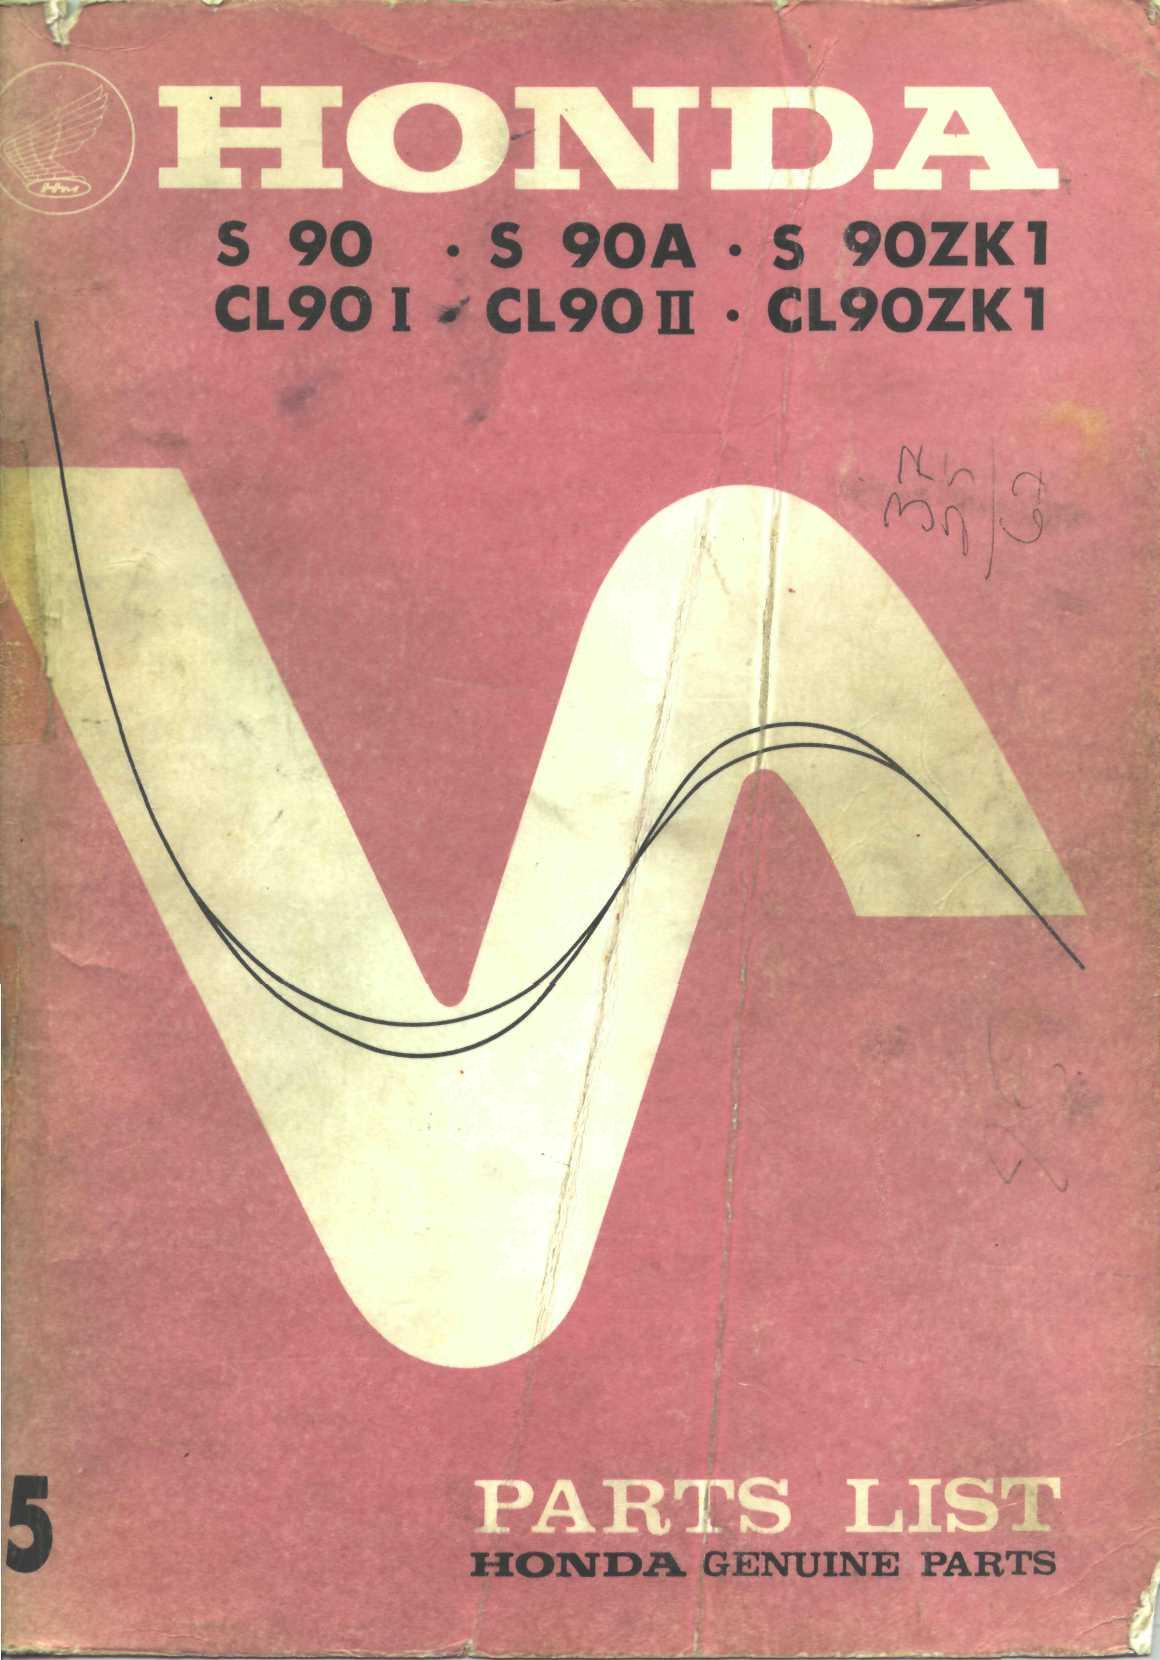 Workshopmanual for Honda CL90ZK1 (1972)